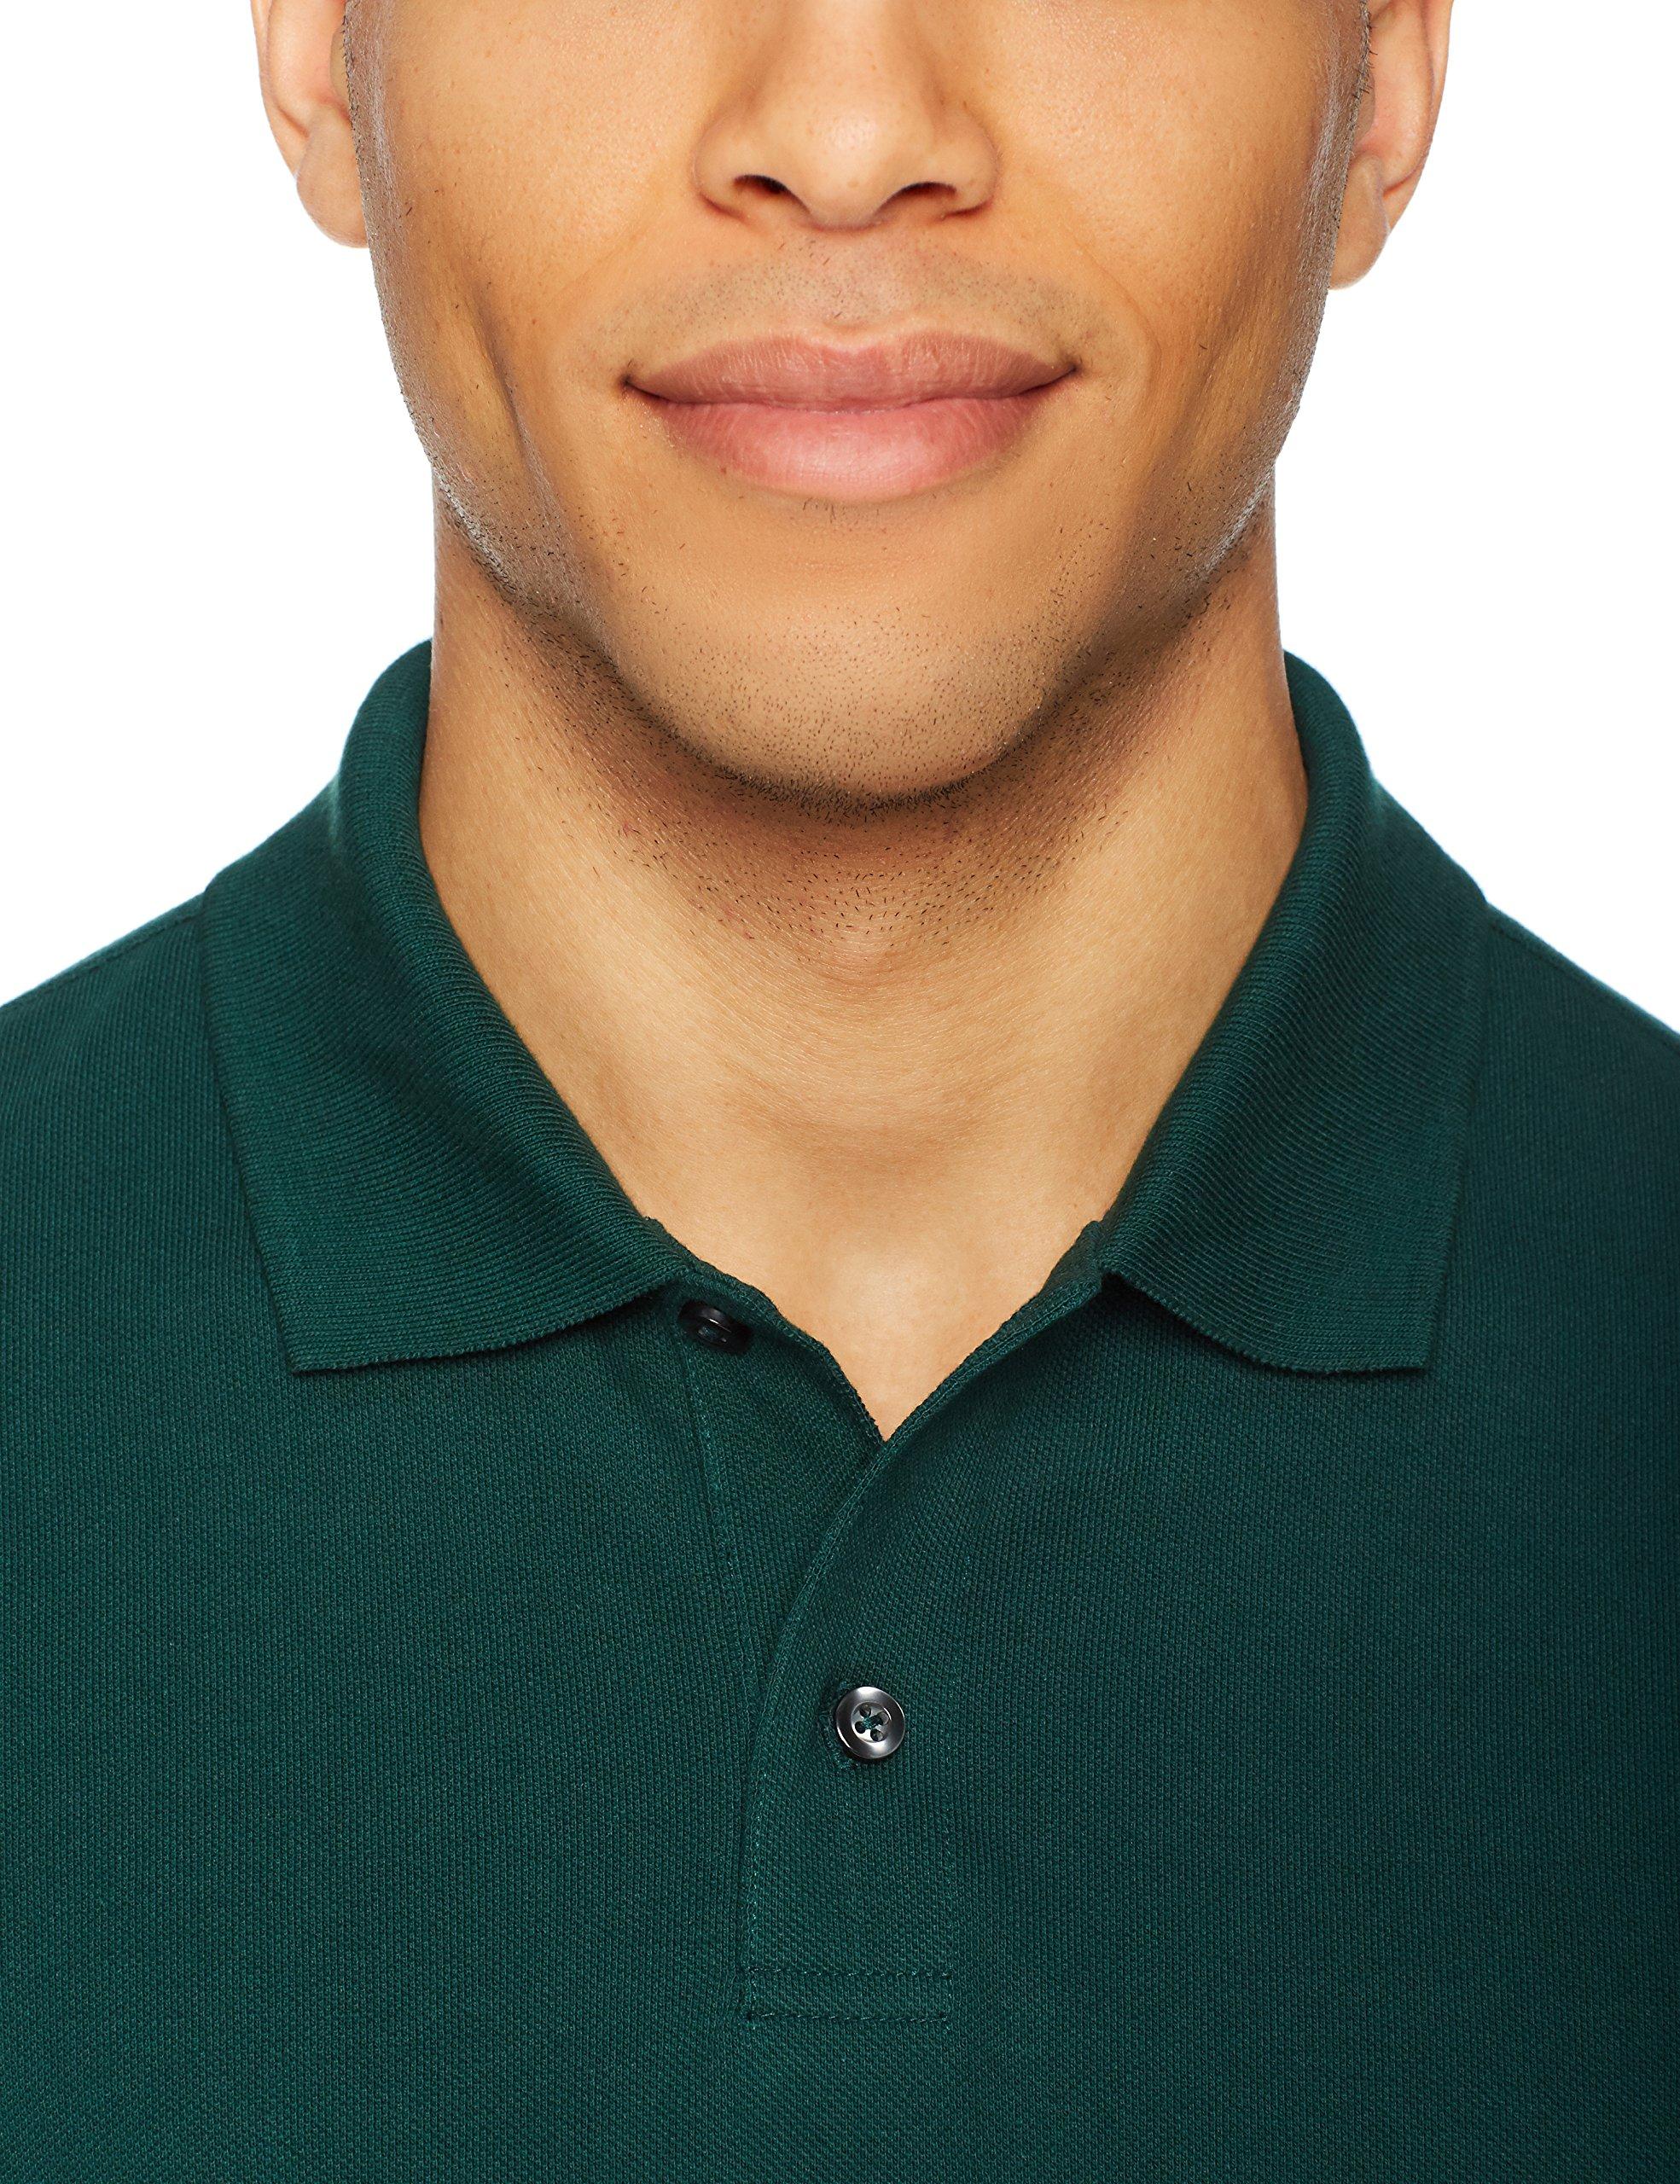 Amazon Essentials Men's Slim-Fit Cotton Pique Polo Shirt, Hunter Green, Large by Amazon Essentials (Image #5)